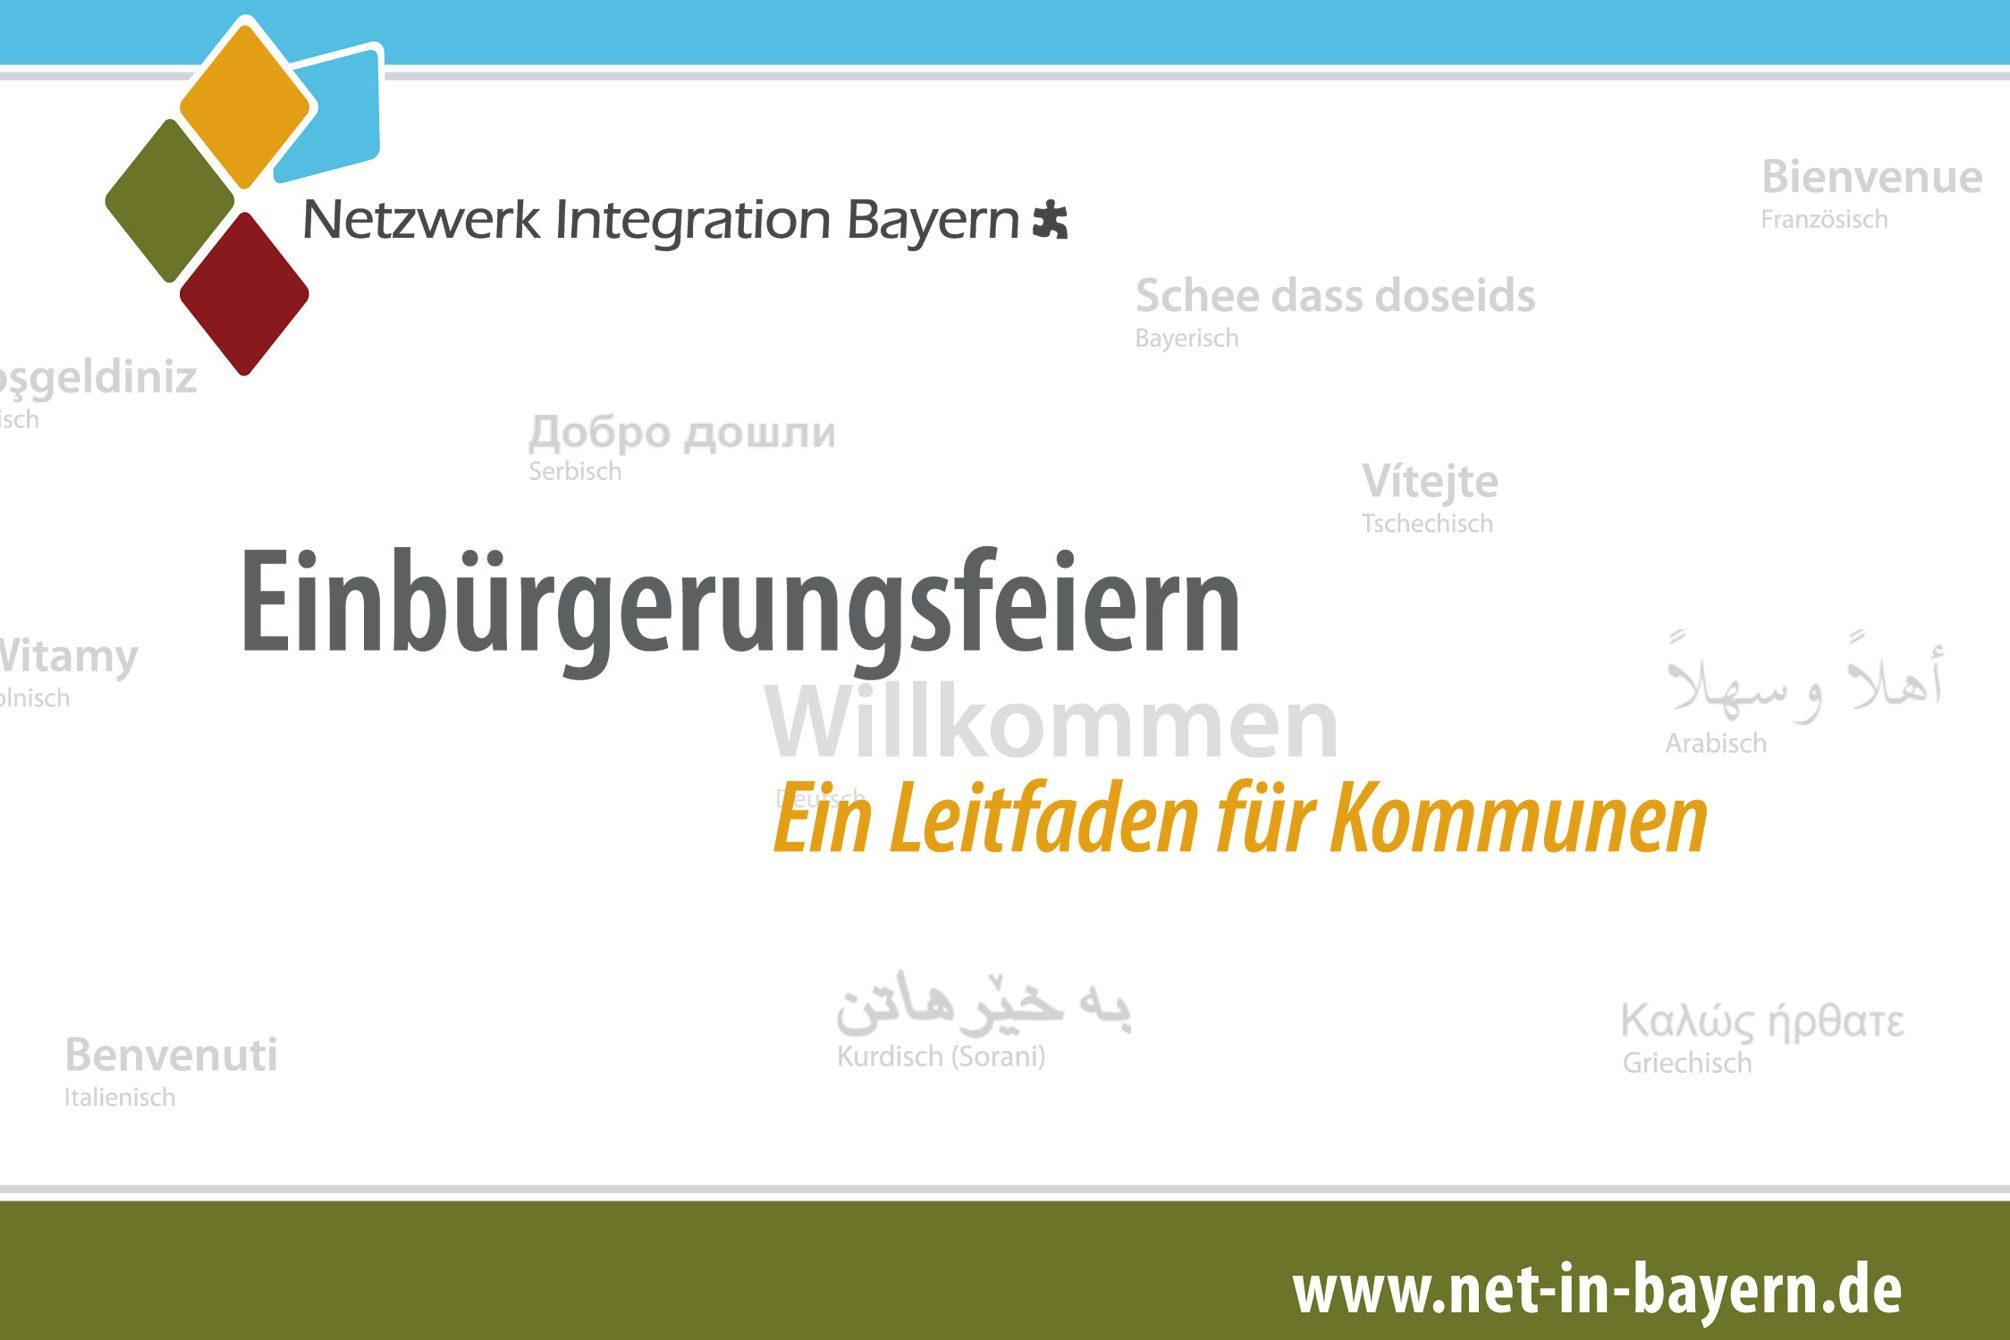 Netzwerk Integration Bayern